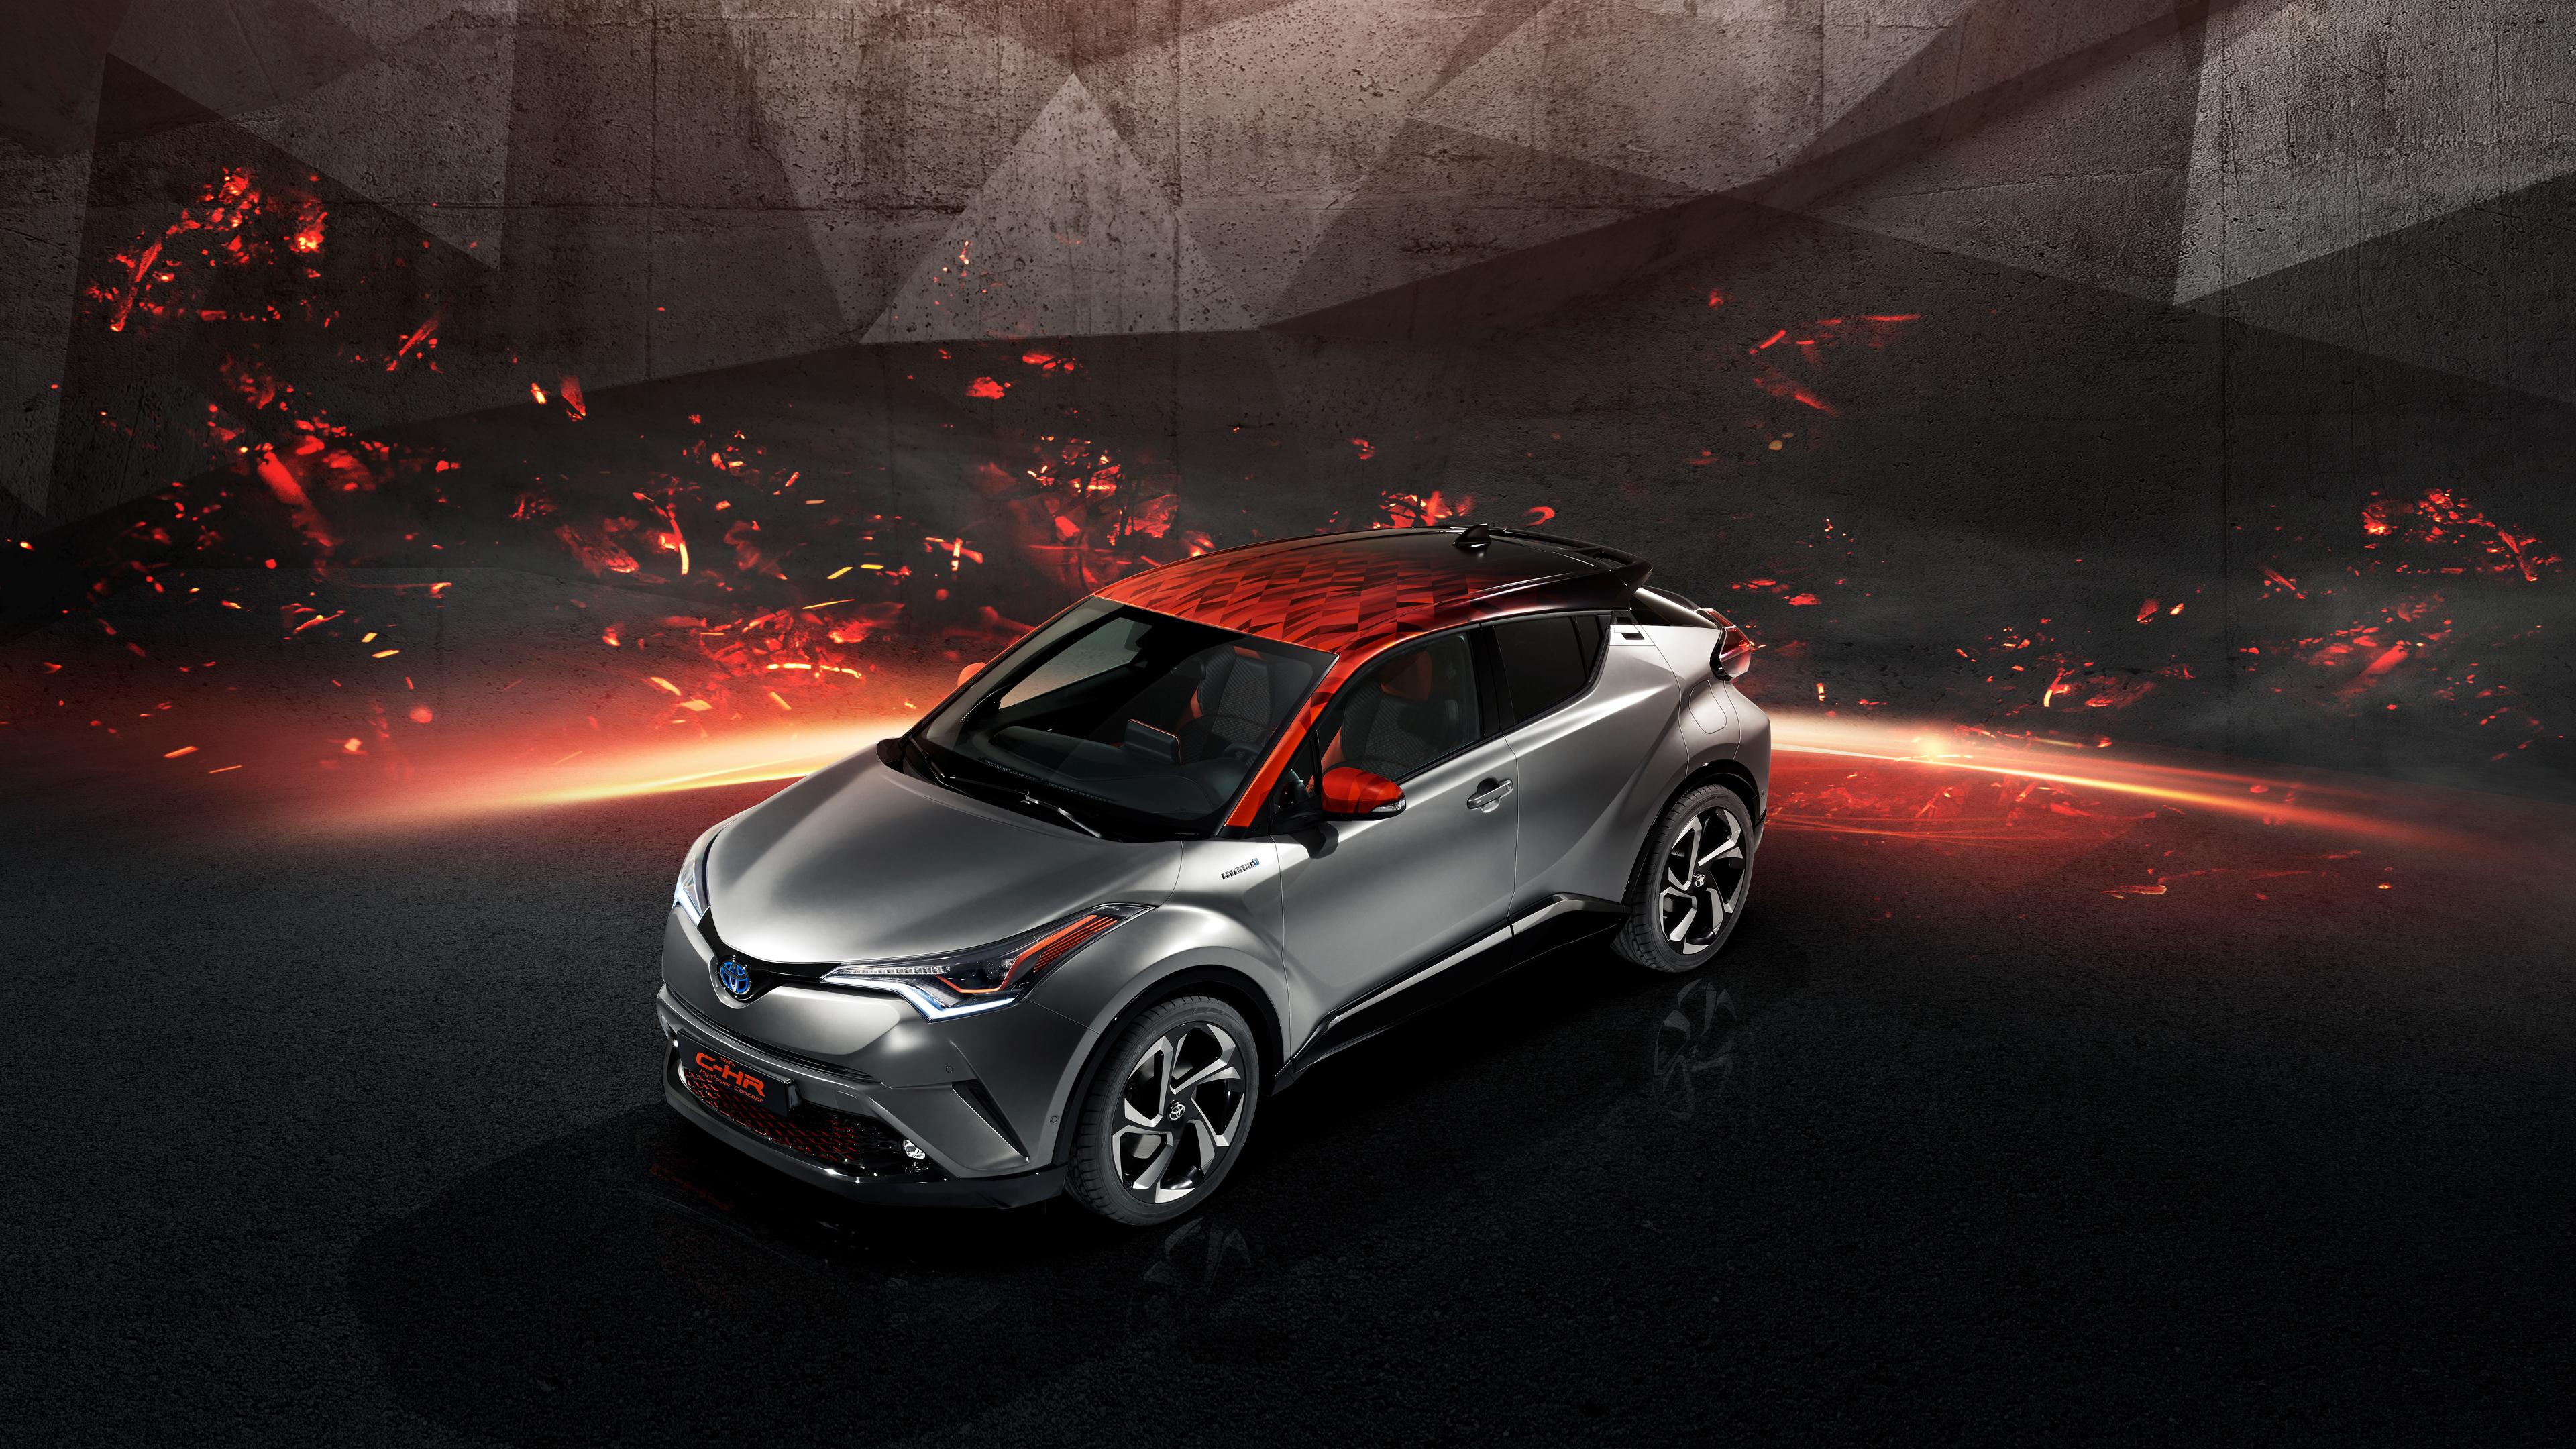 2018 Toyota Rav4 Hybrid >> Toyota C HR Hy Power Concept 2017 Frankfurt Motor Show 4K Wallpaper | HD Car Wallpapers | ID #8526